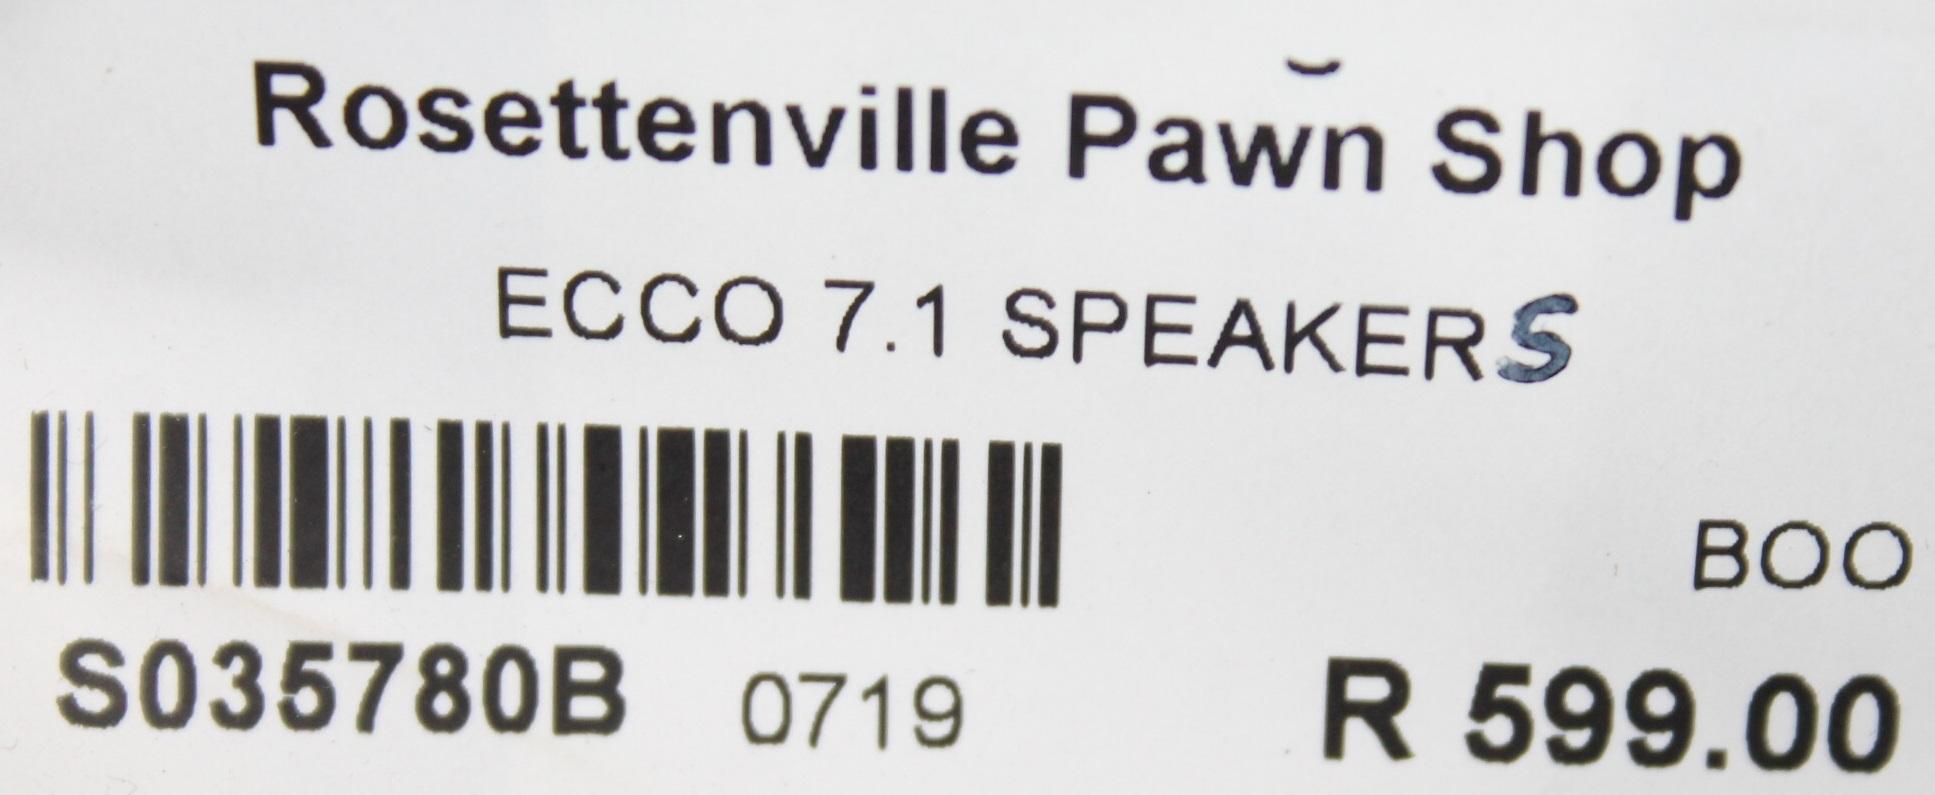 S035780B Ecco 7.1 speakers #Rosettenvillepawnshop